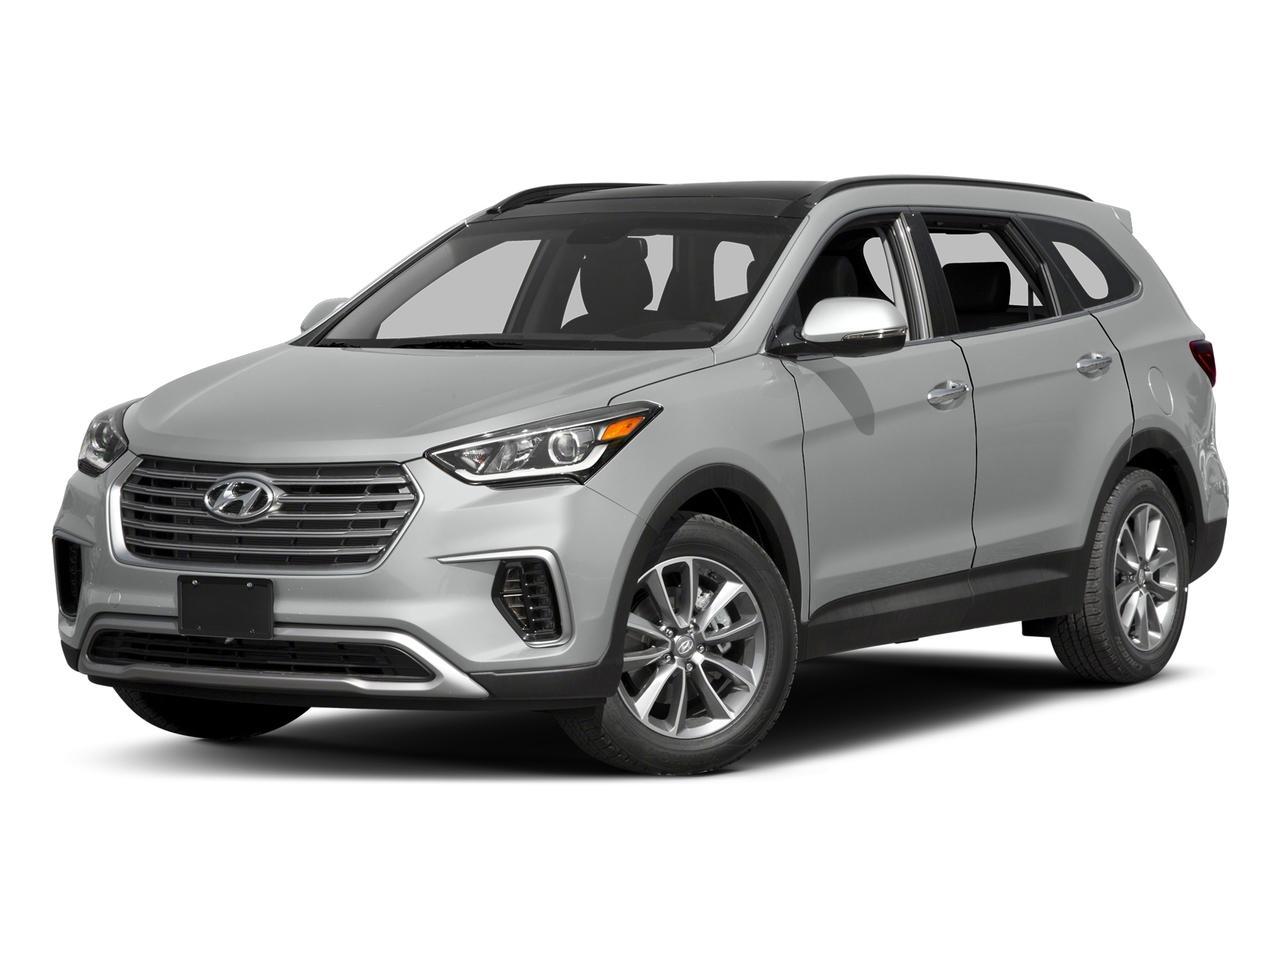 2017 Hyundai Santa Fe Vehicle Photo in San Angelo, TX 76901